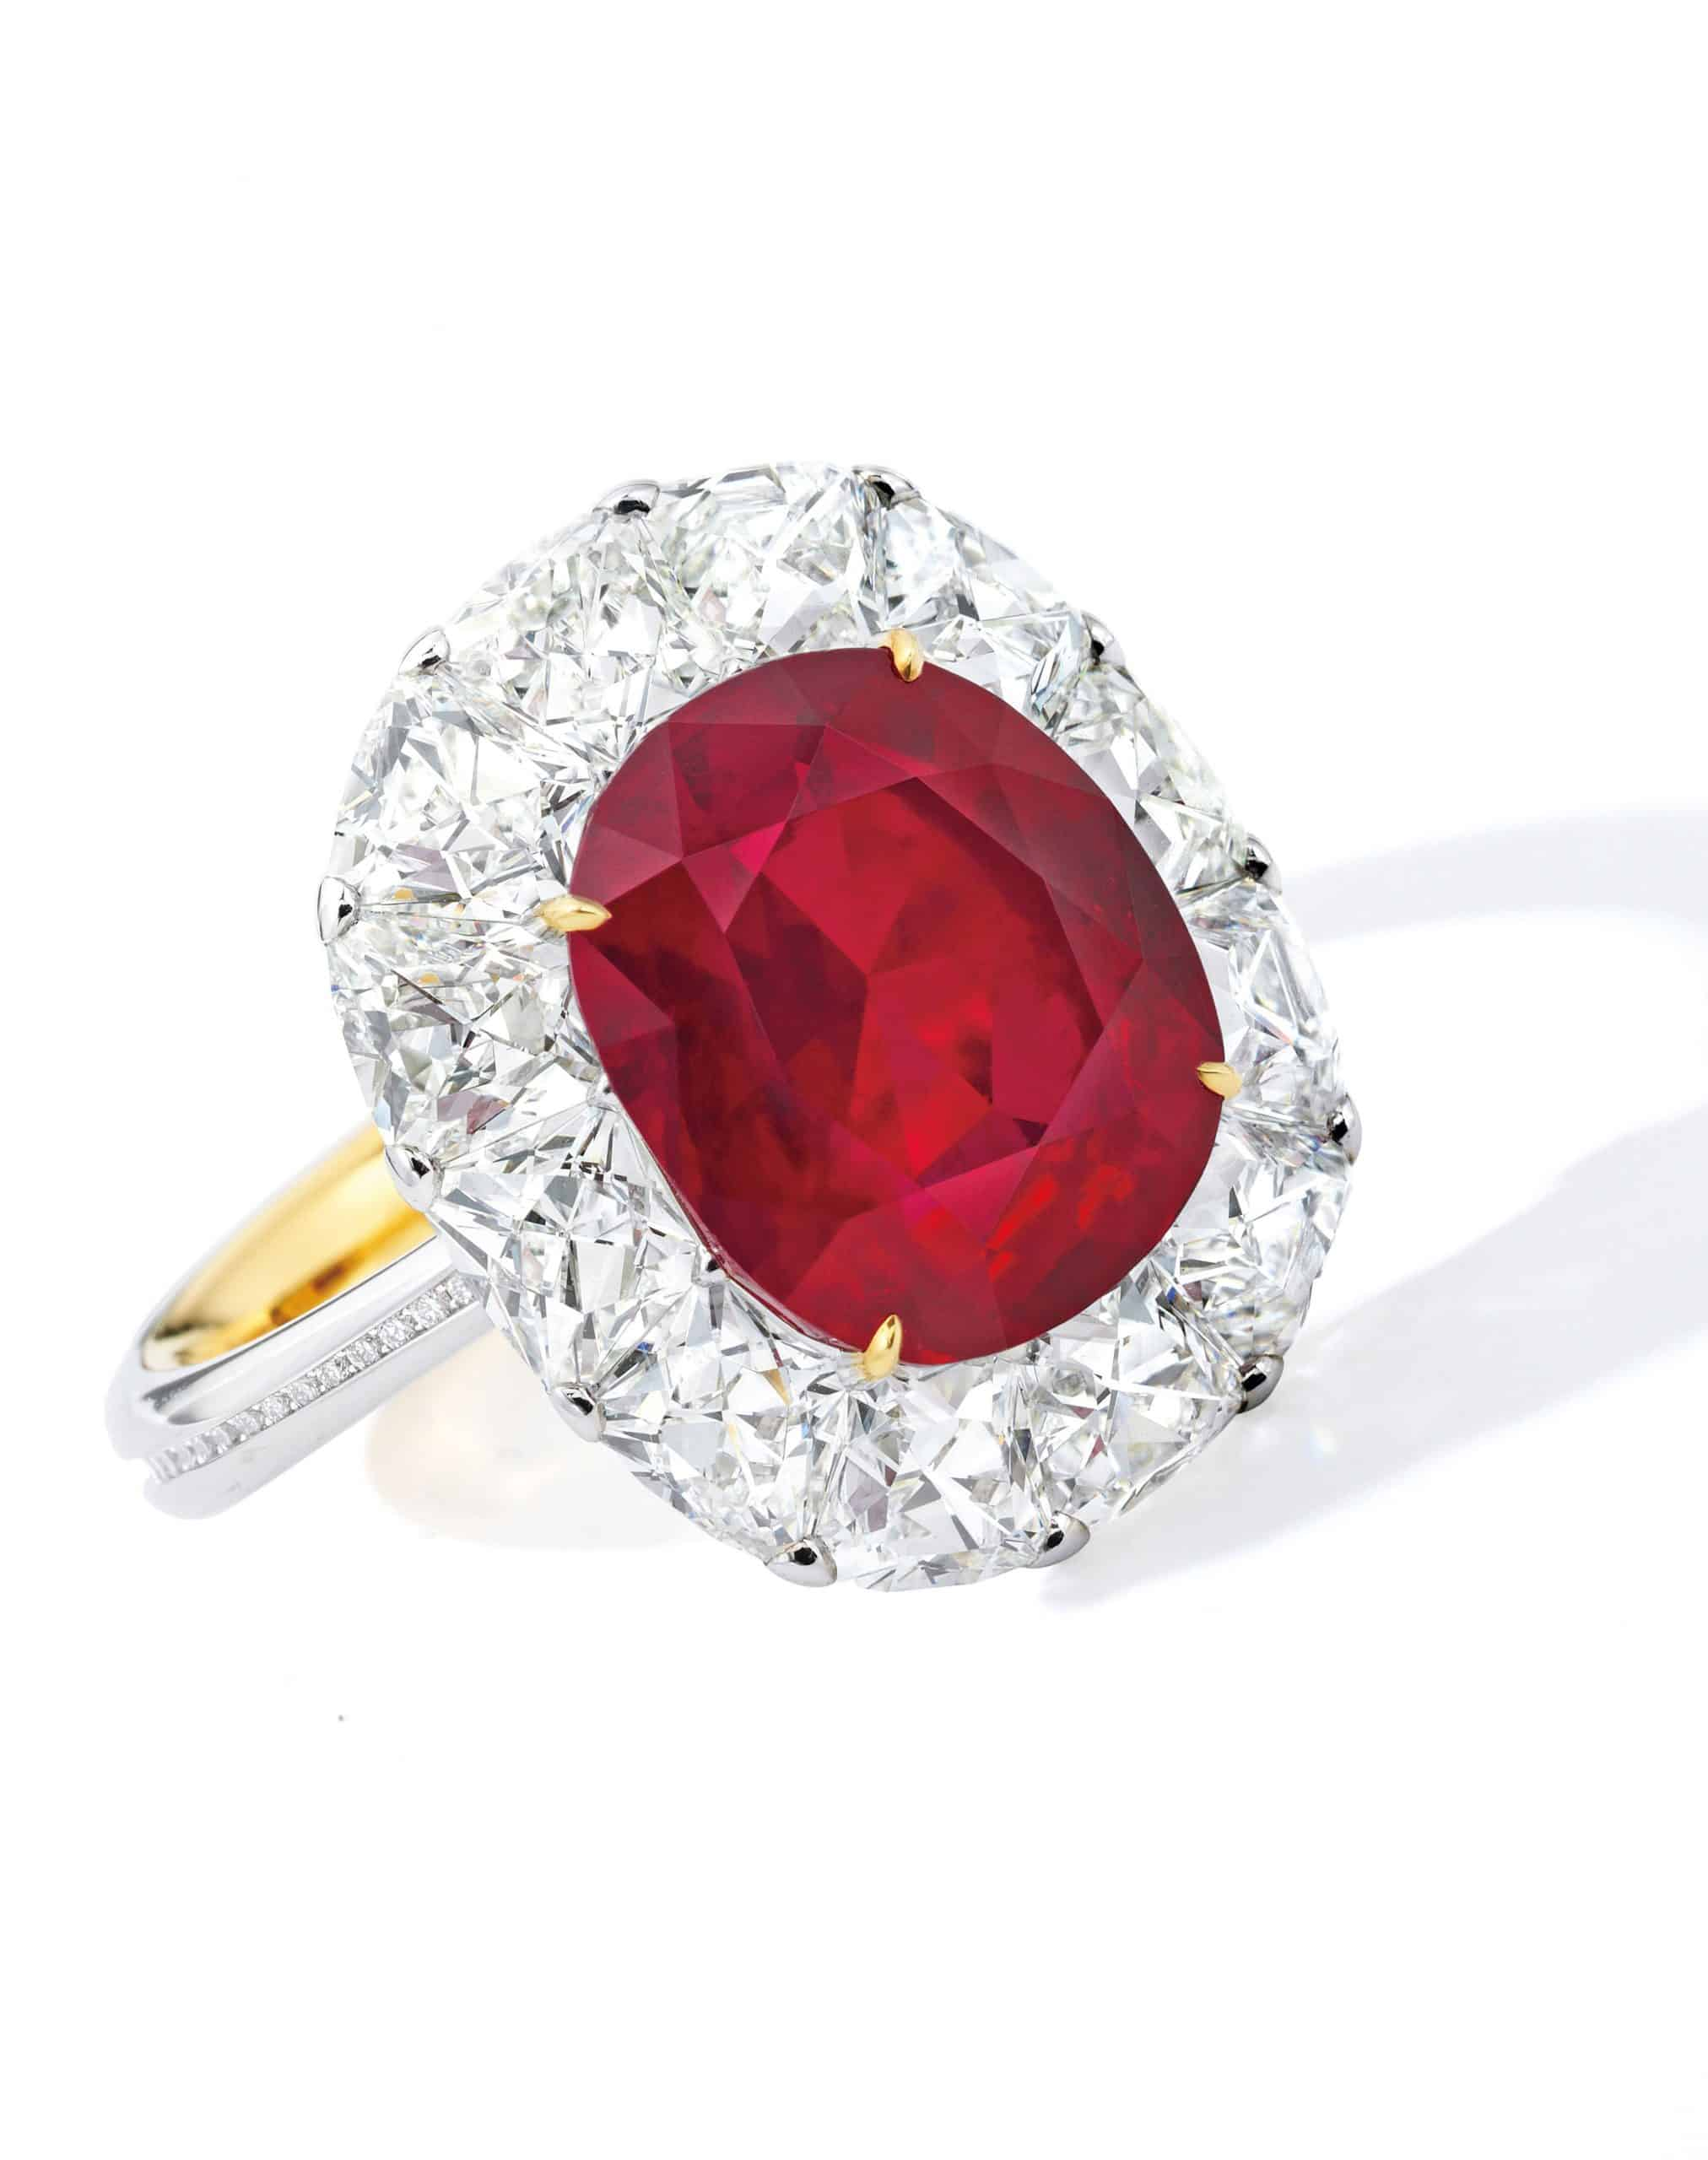 6.41-carat untreated Burmese ruby and diamond ring